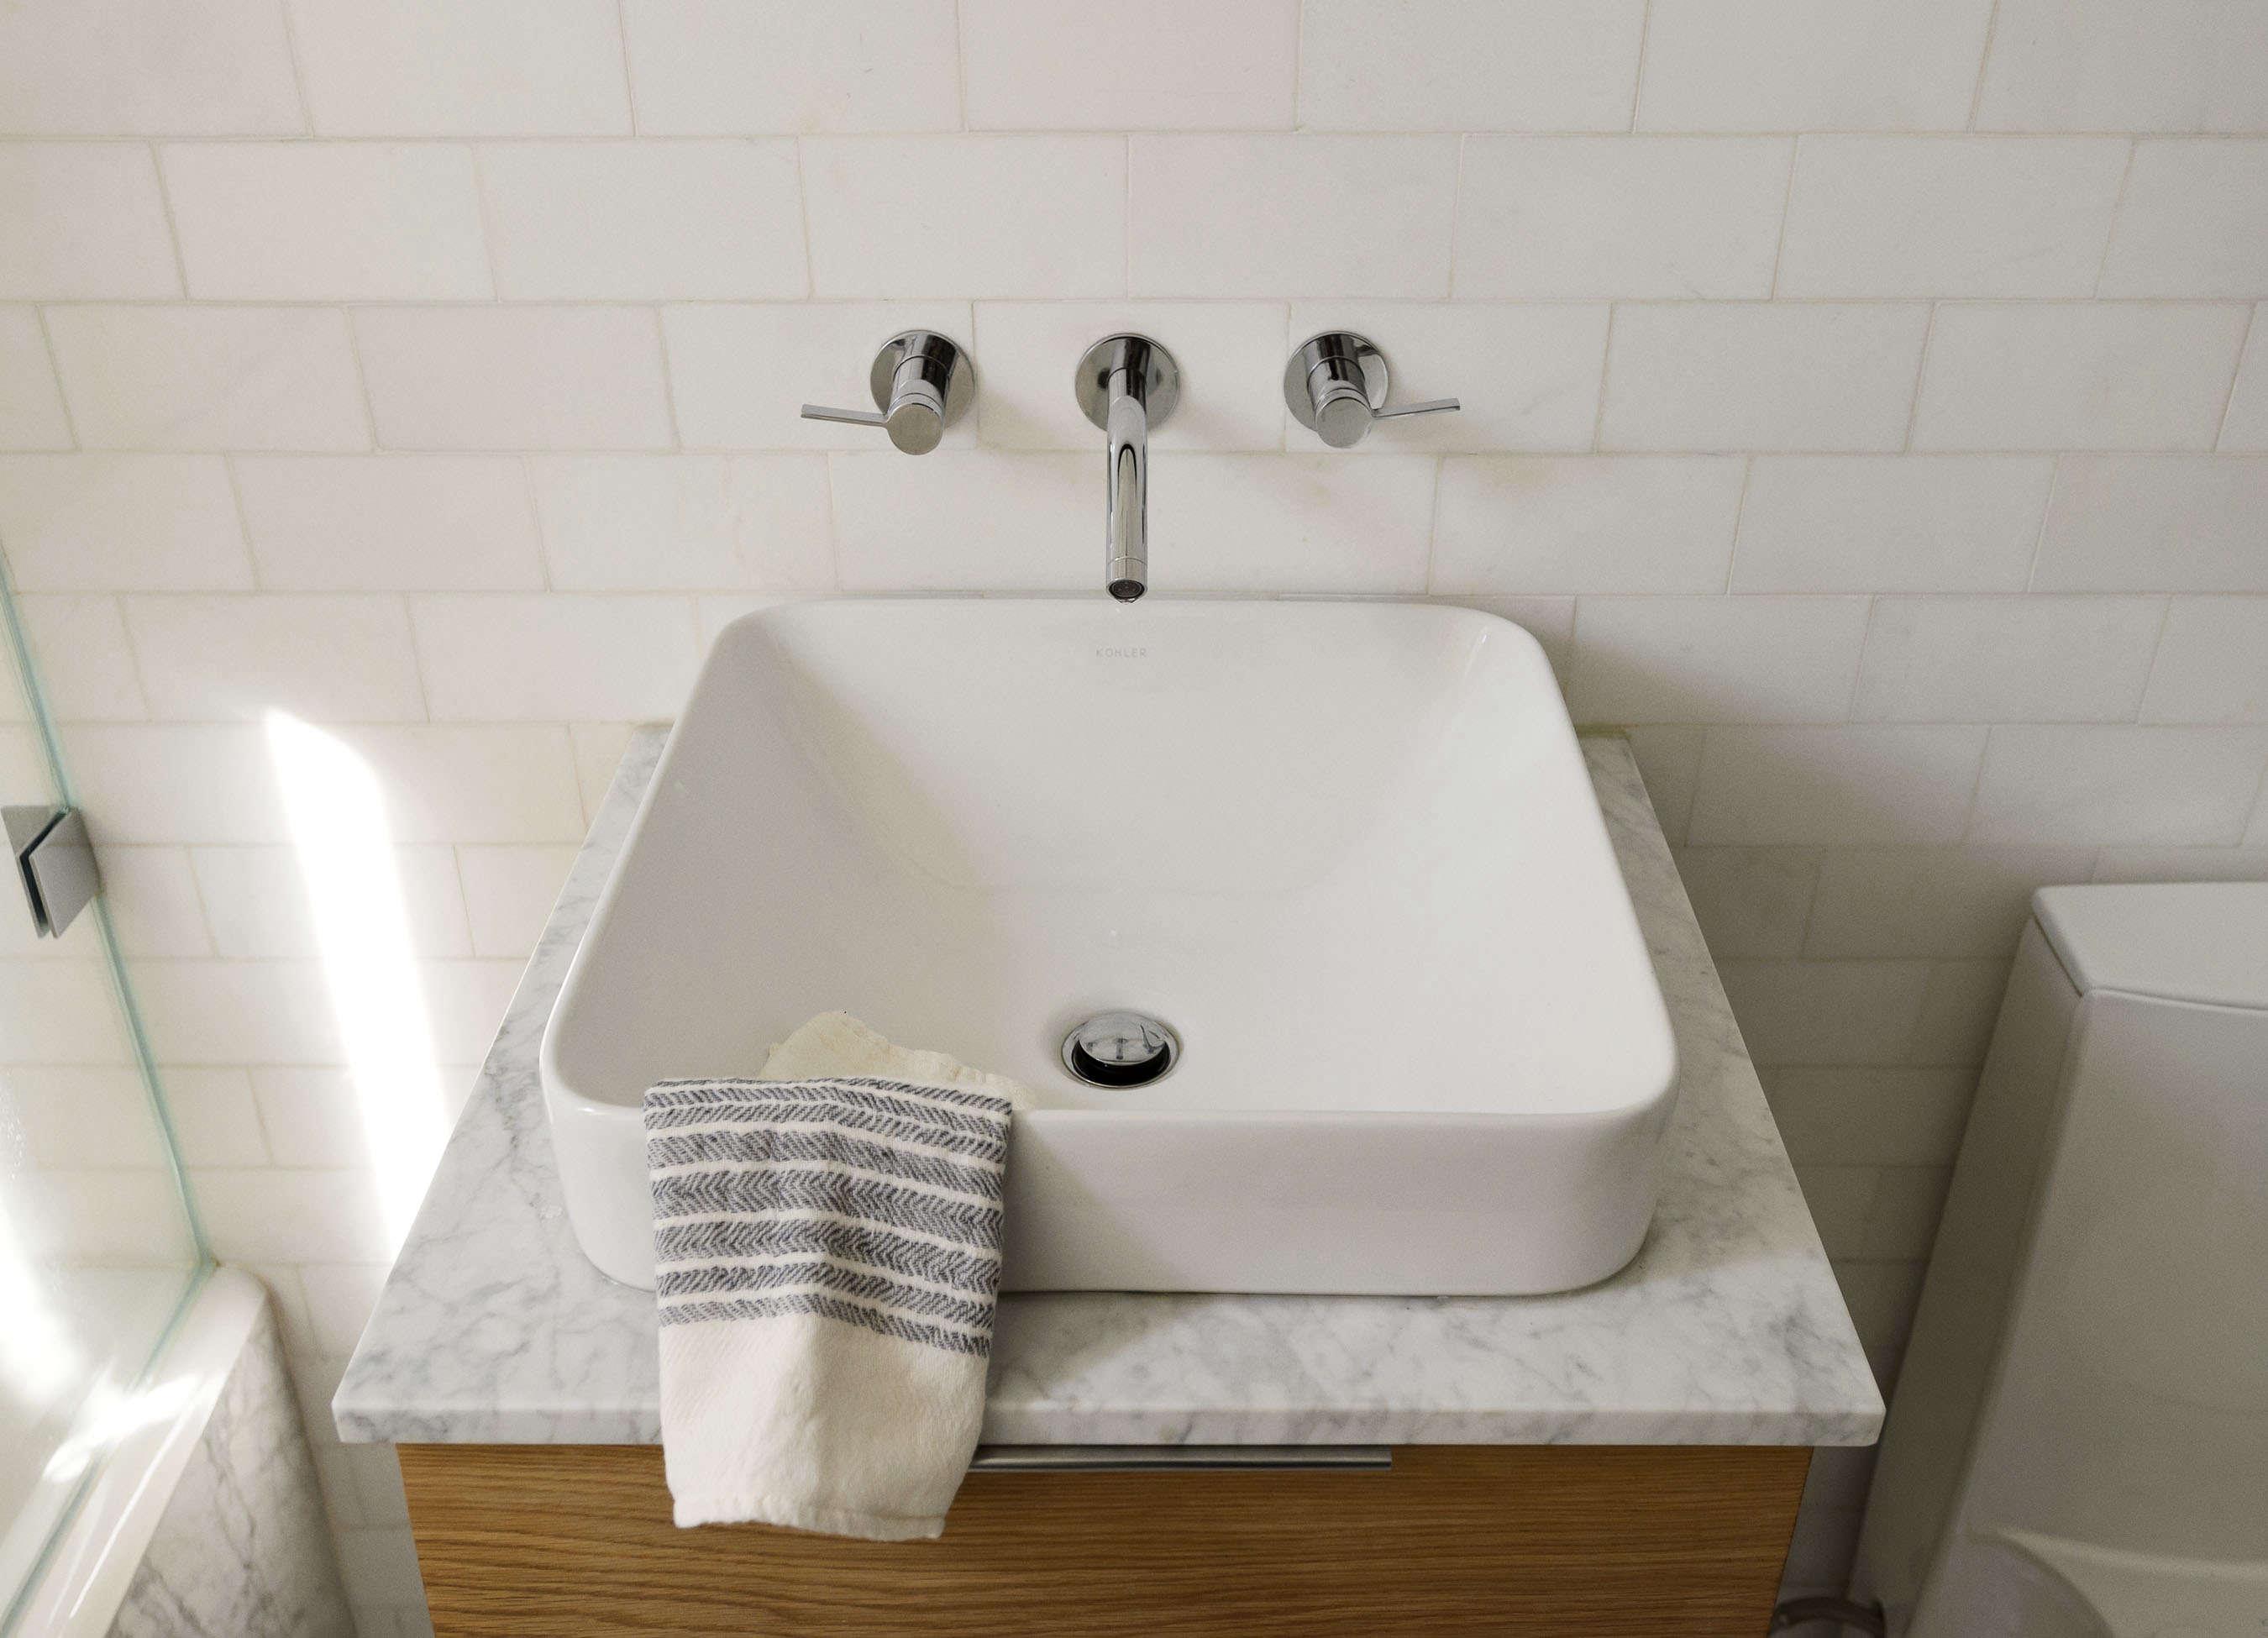 Vox Rectangle Vessel AboveCounter Bathroom Sink - Remodelista bathroom